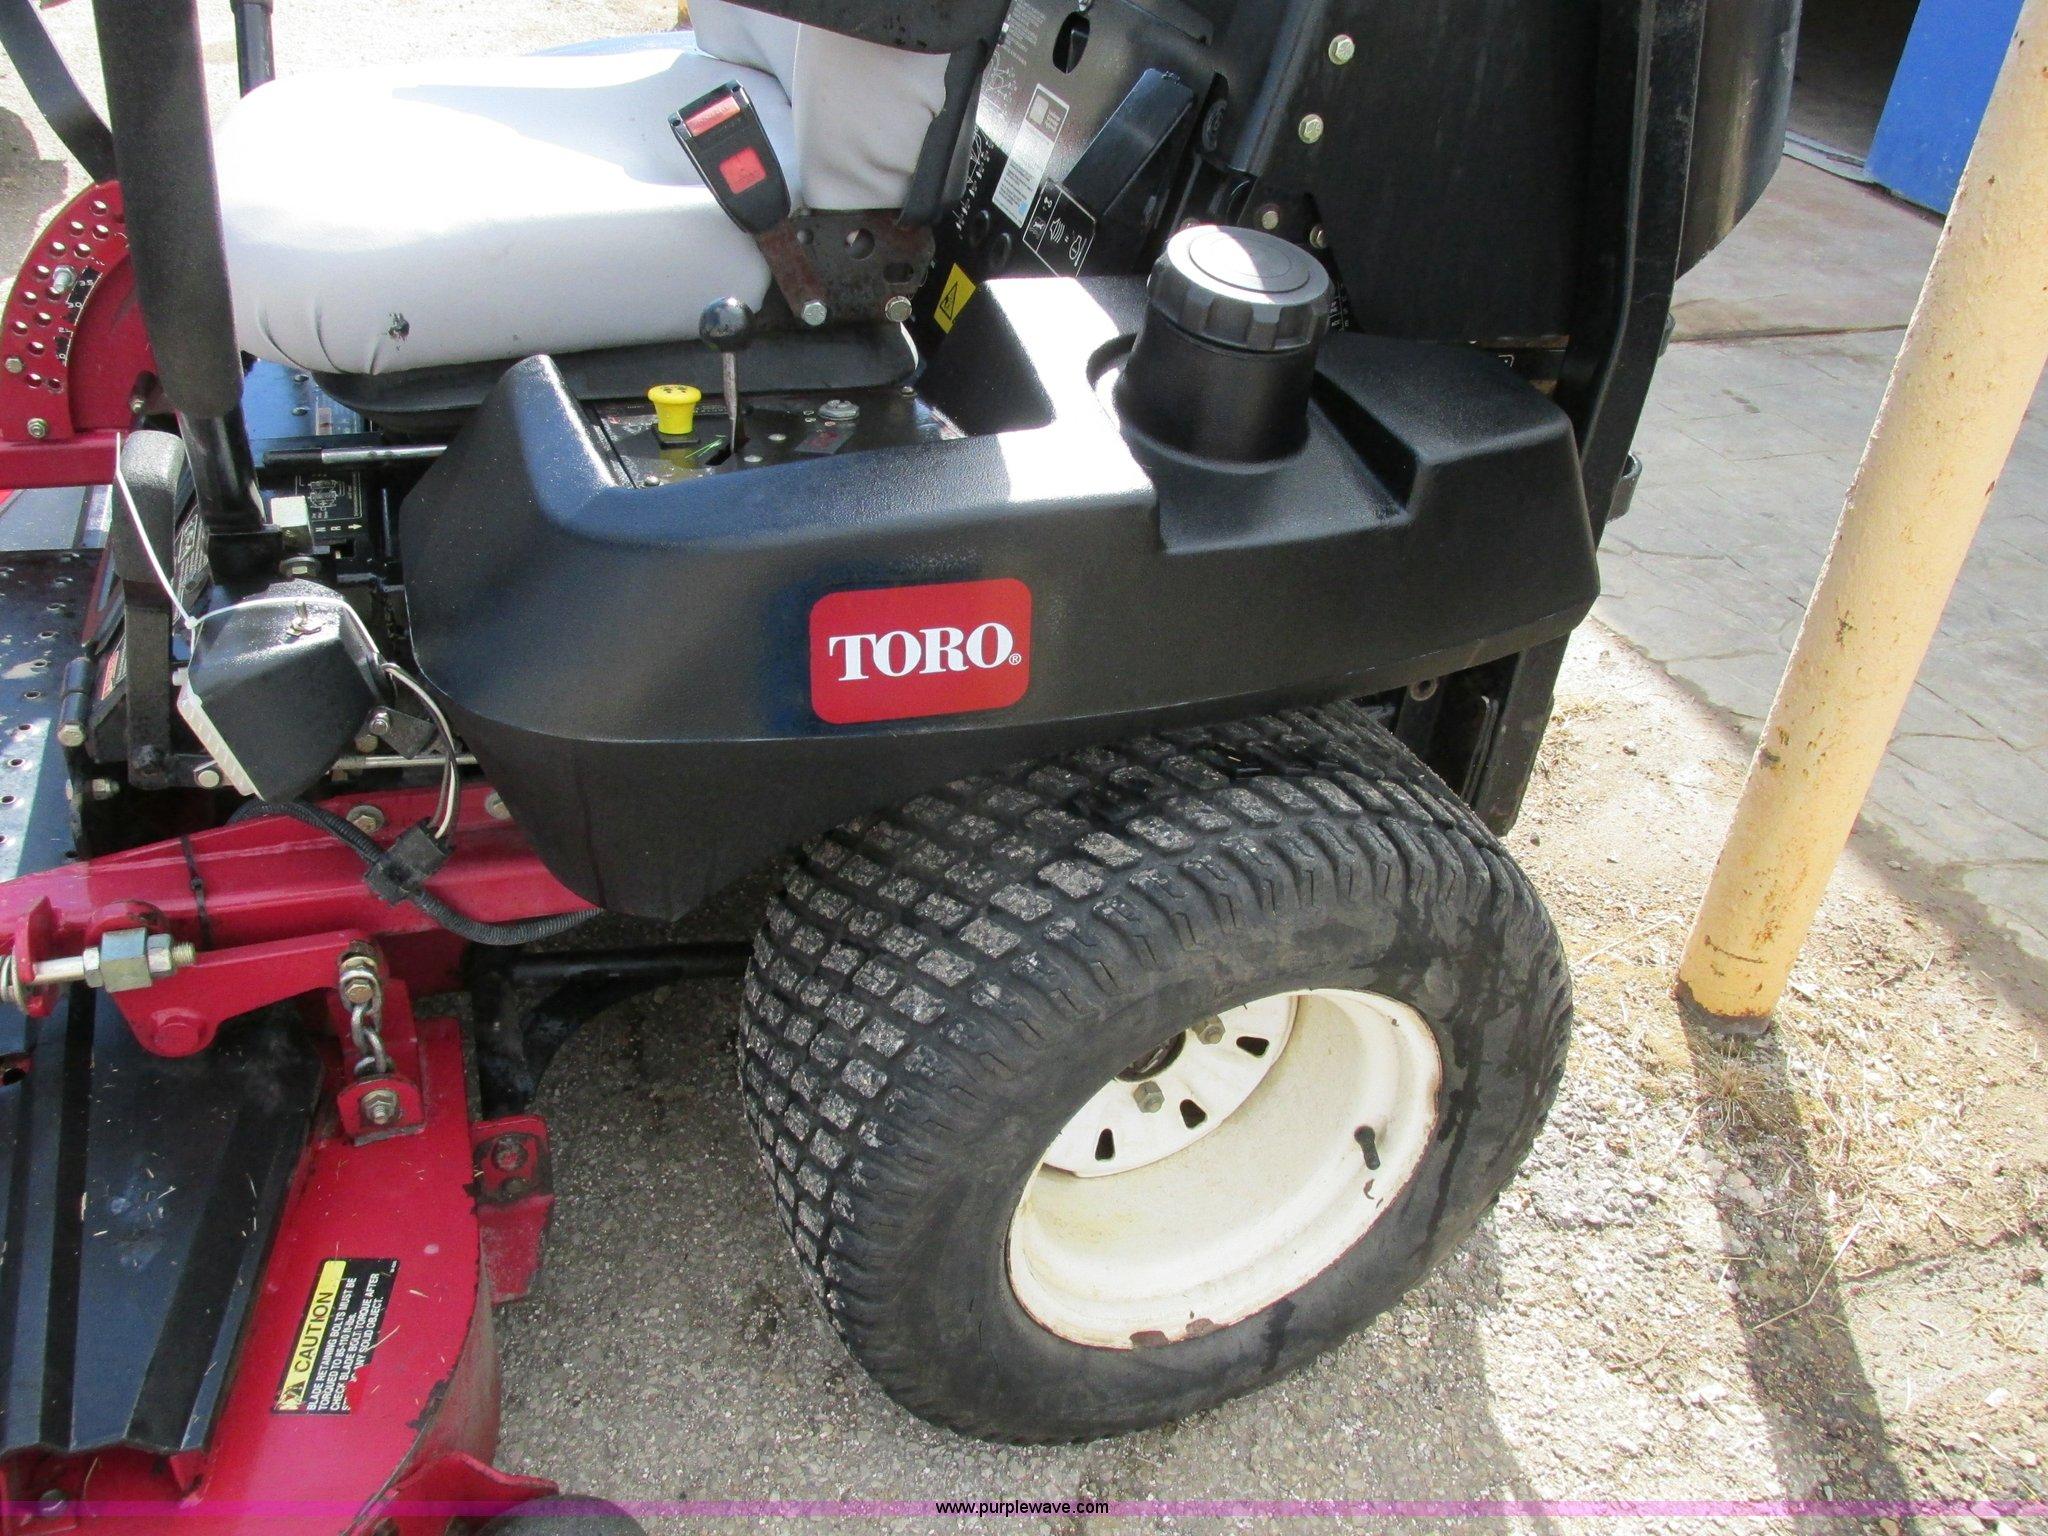 Toro Z-589 Z-Master 74253 ZTR lawn mower | Item Z9217 | SOLD